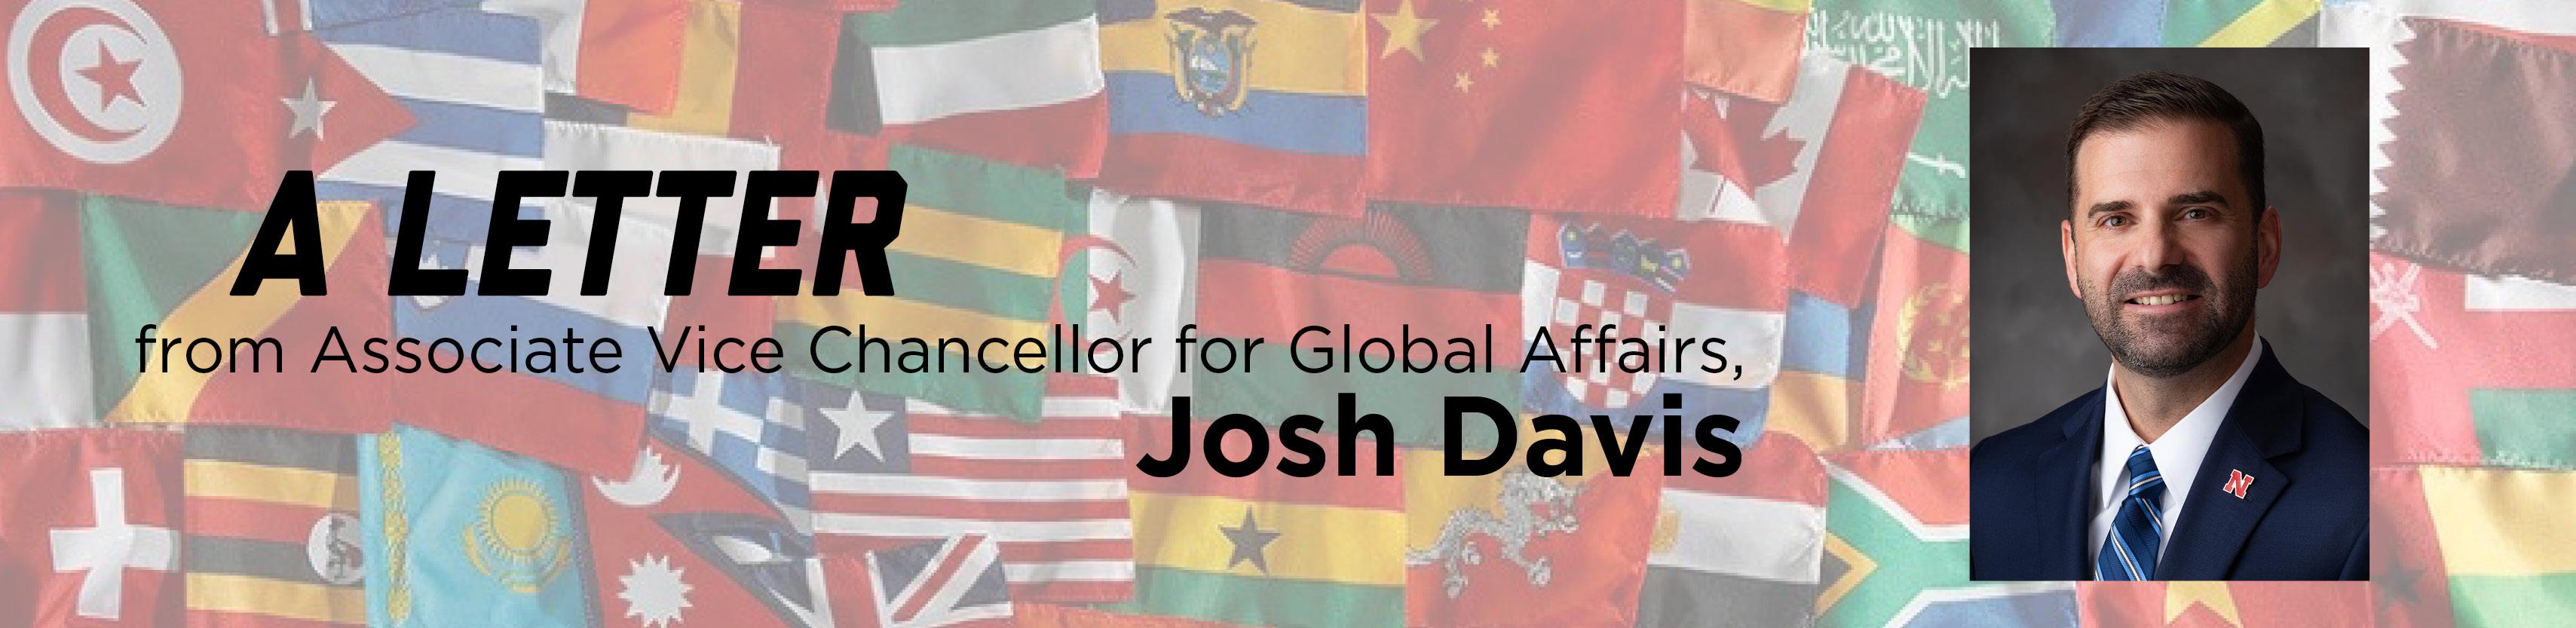 Associate Vice Chancellor for Global Affairs, Josh Davis